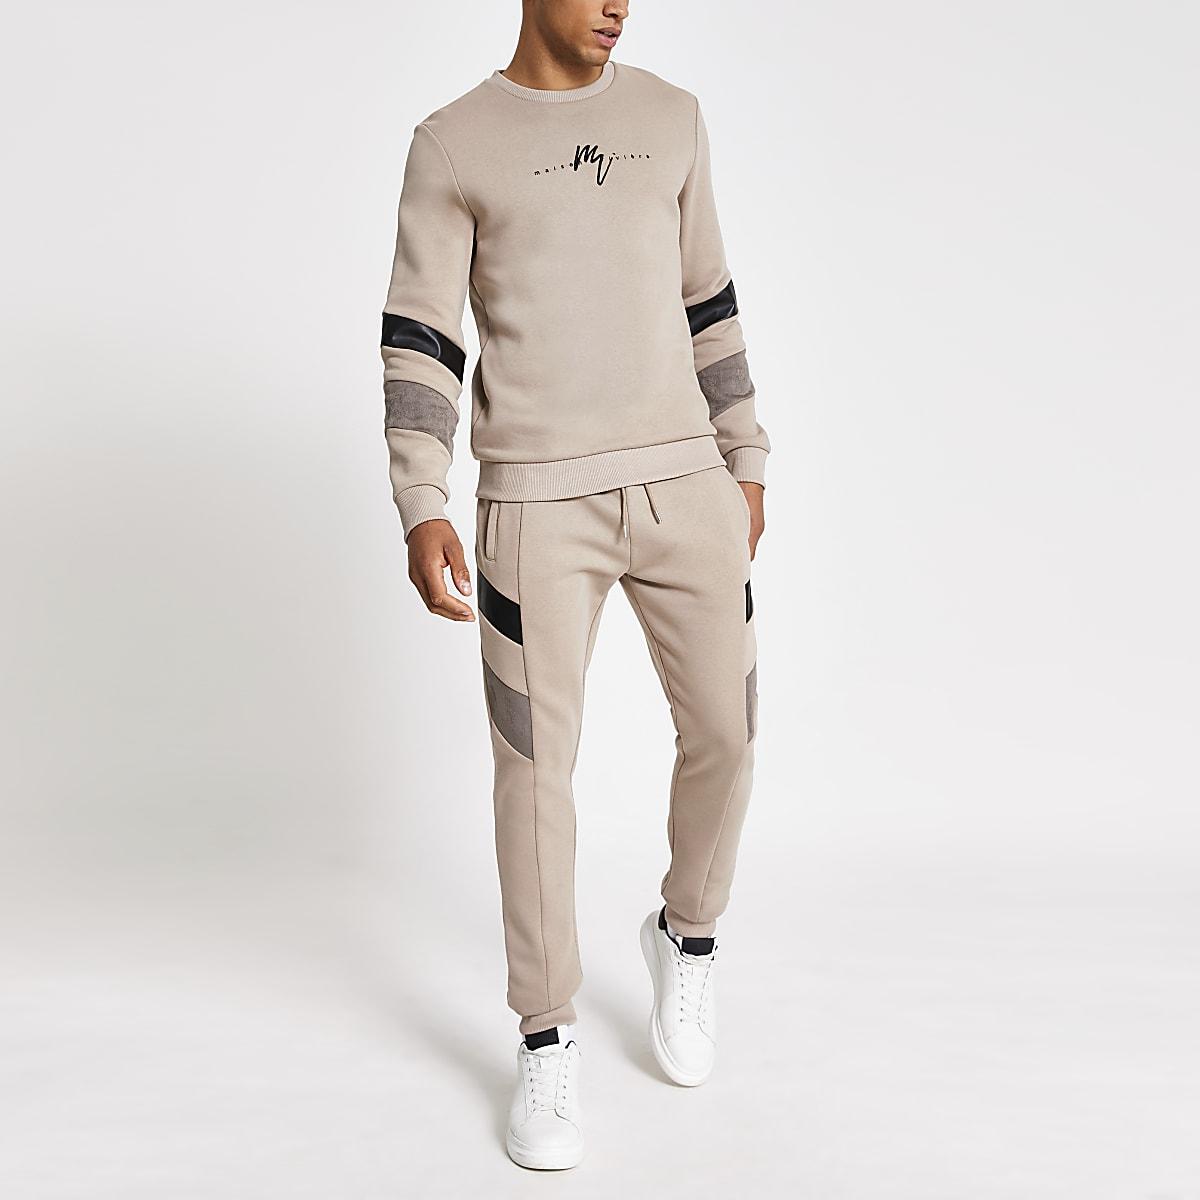 Stone blocked Maison Riviera sweatshirt